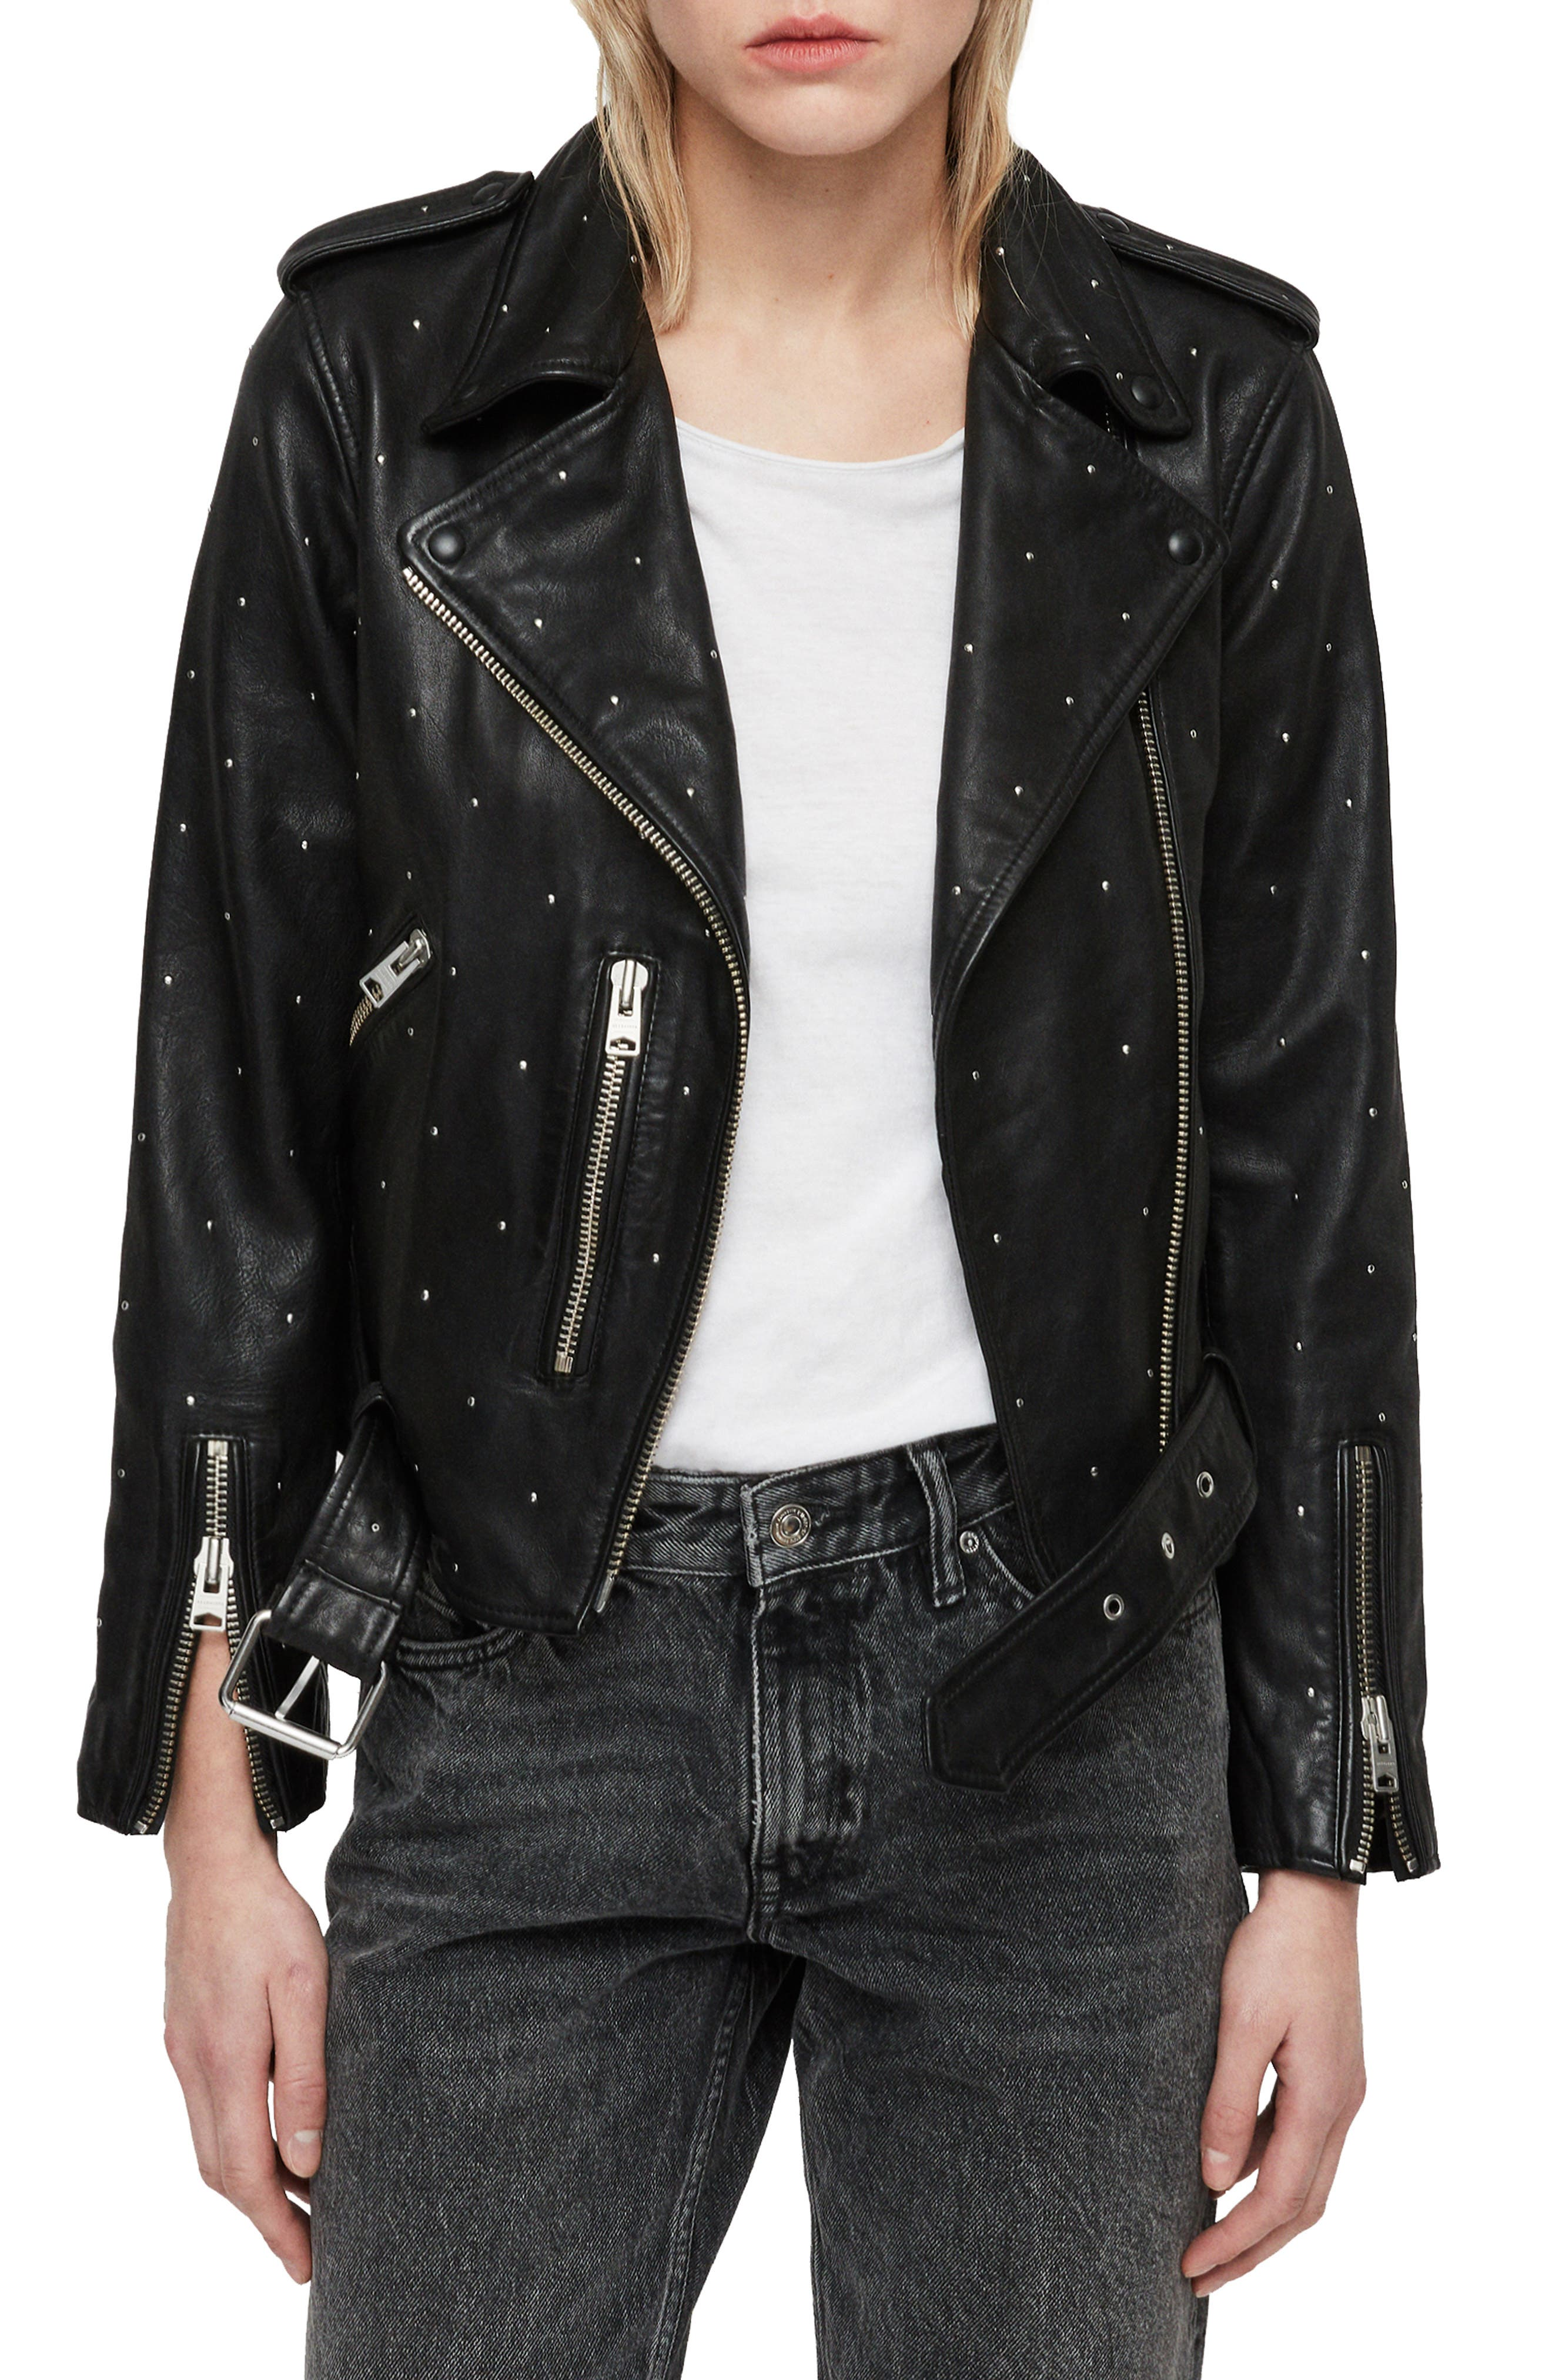 Balfern Studded Leather Biker Jacket,                             Main thumbnail 1, color,                             BLACK